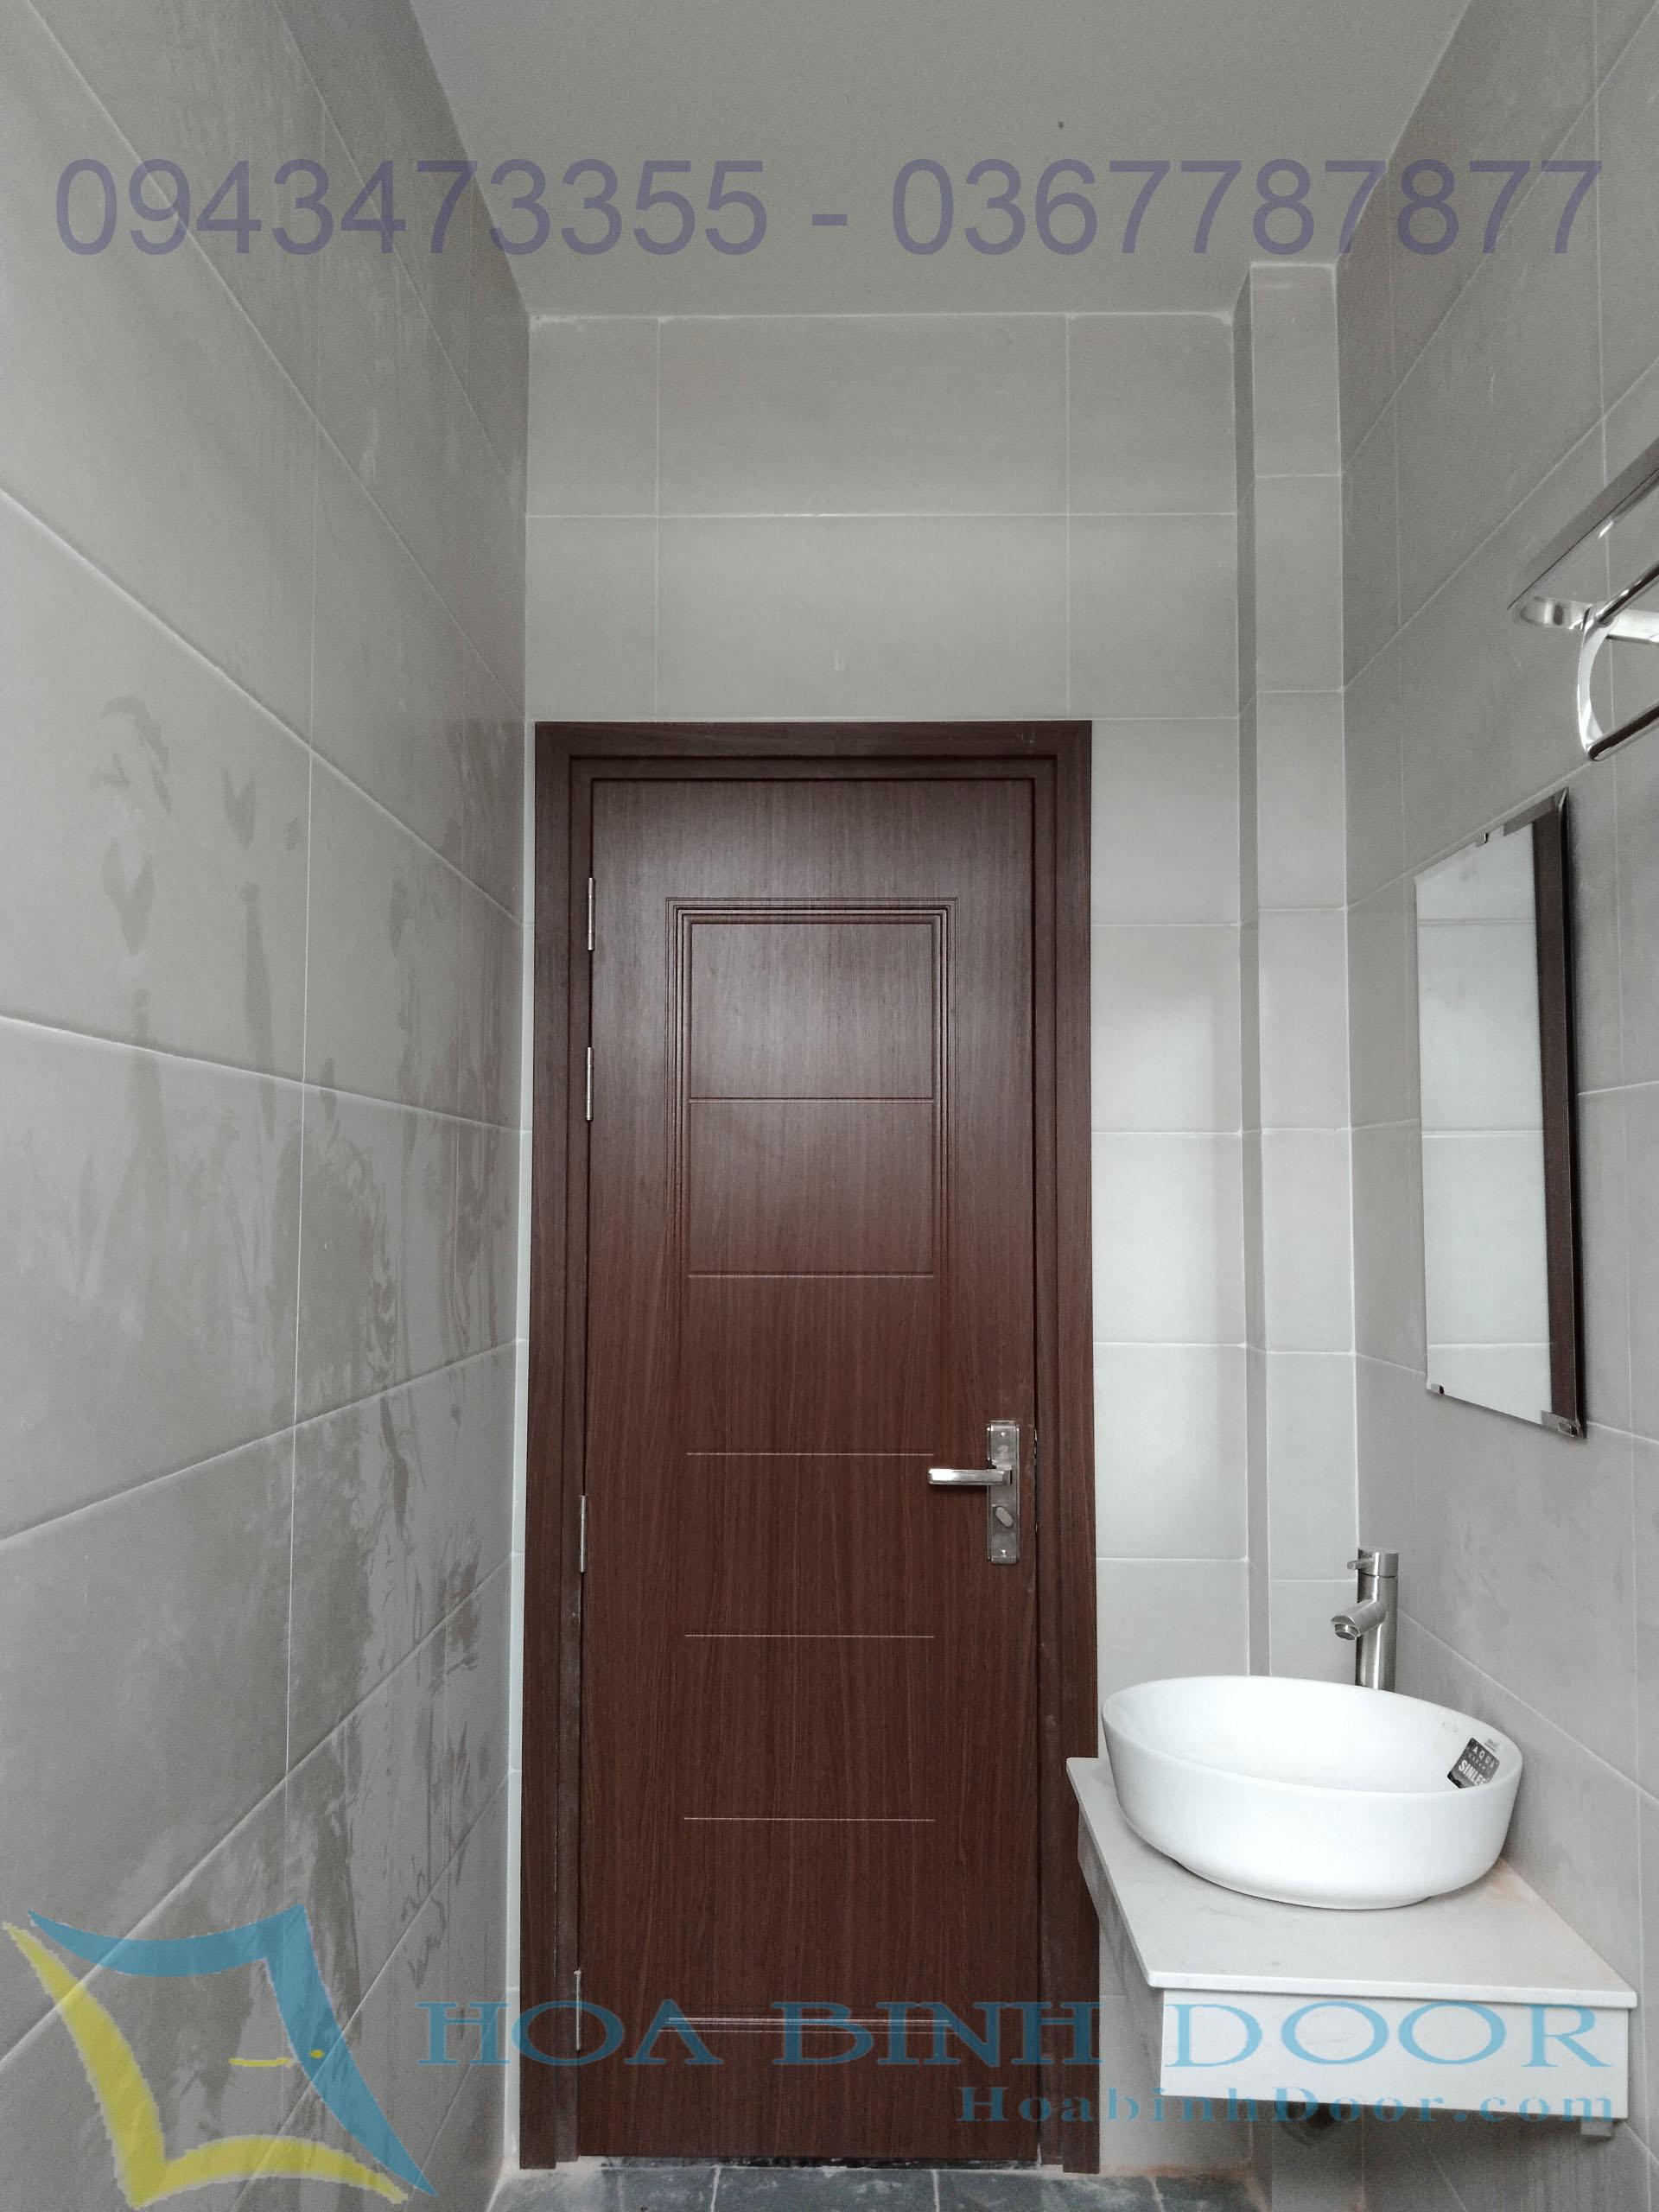 cửa nhựa composite lắp toilet dong phủ da